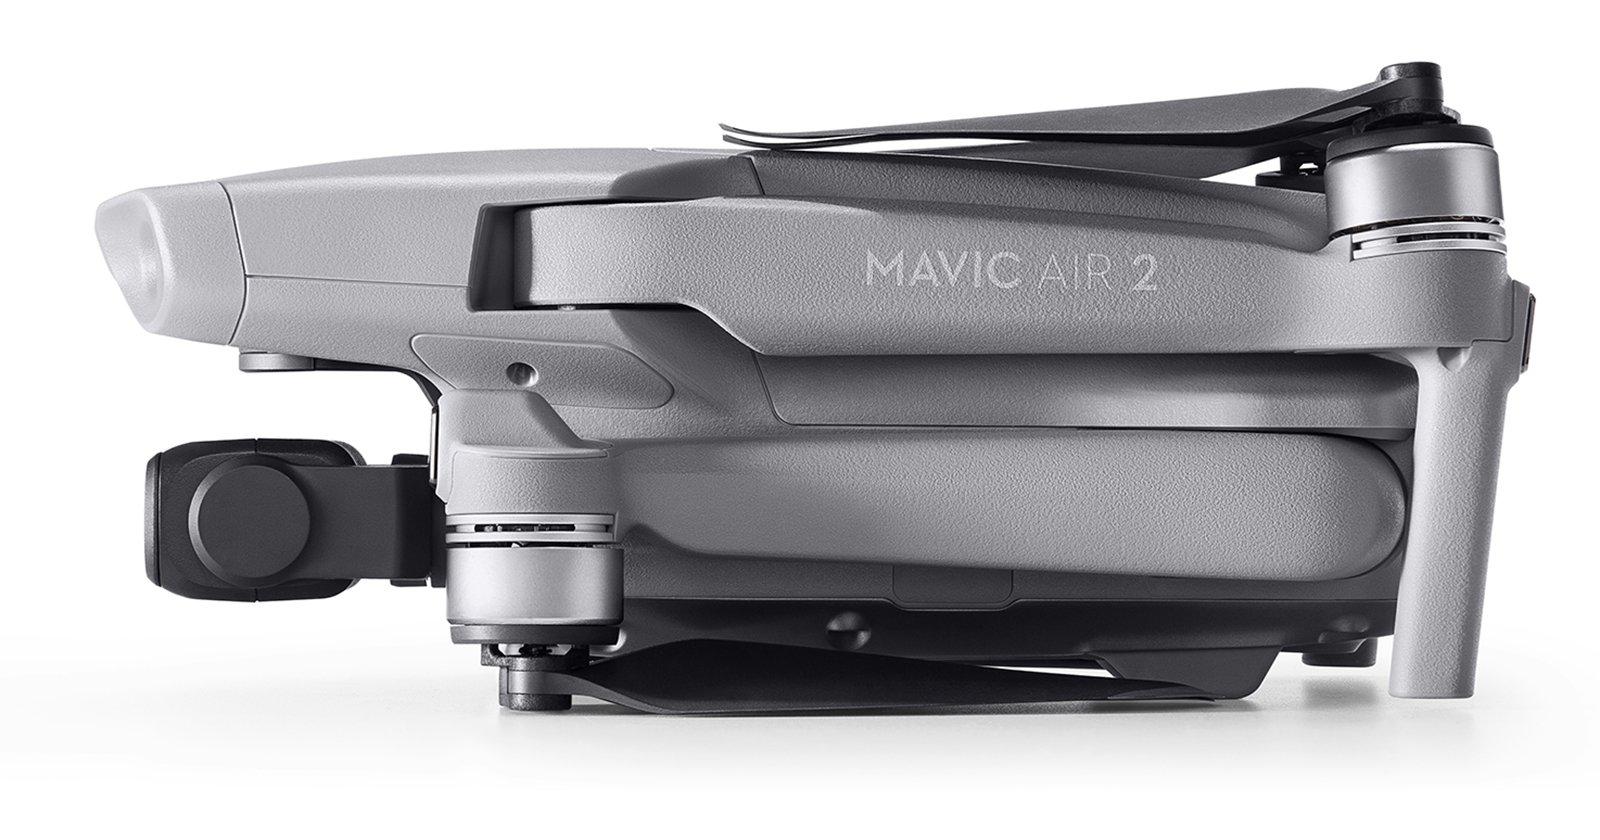 DJI Mavic Air 2 Gets Digital Zoom, 4K Hyperlapse and More in Free Update - PetaPixel